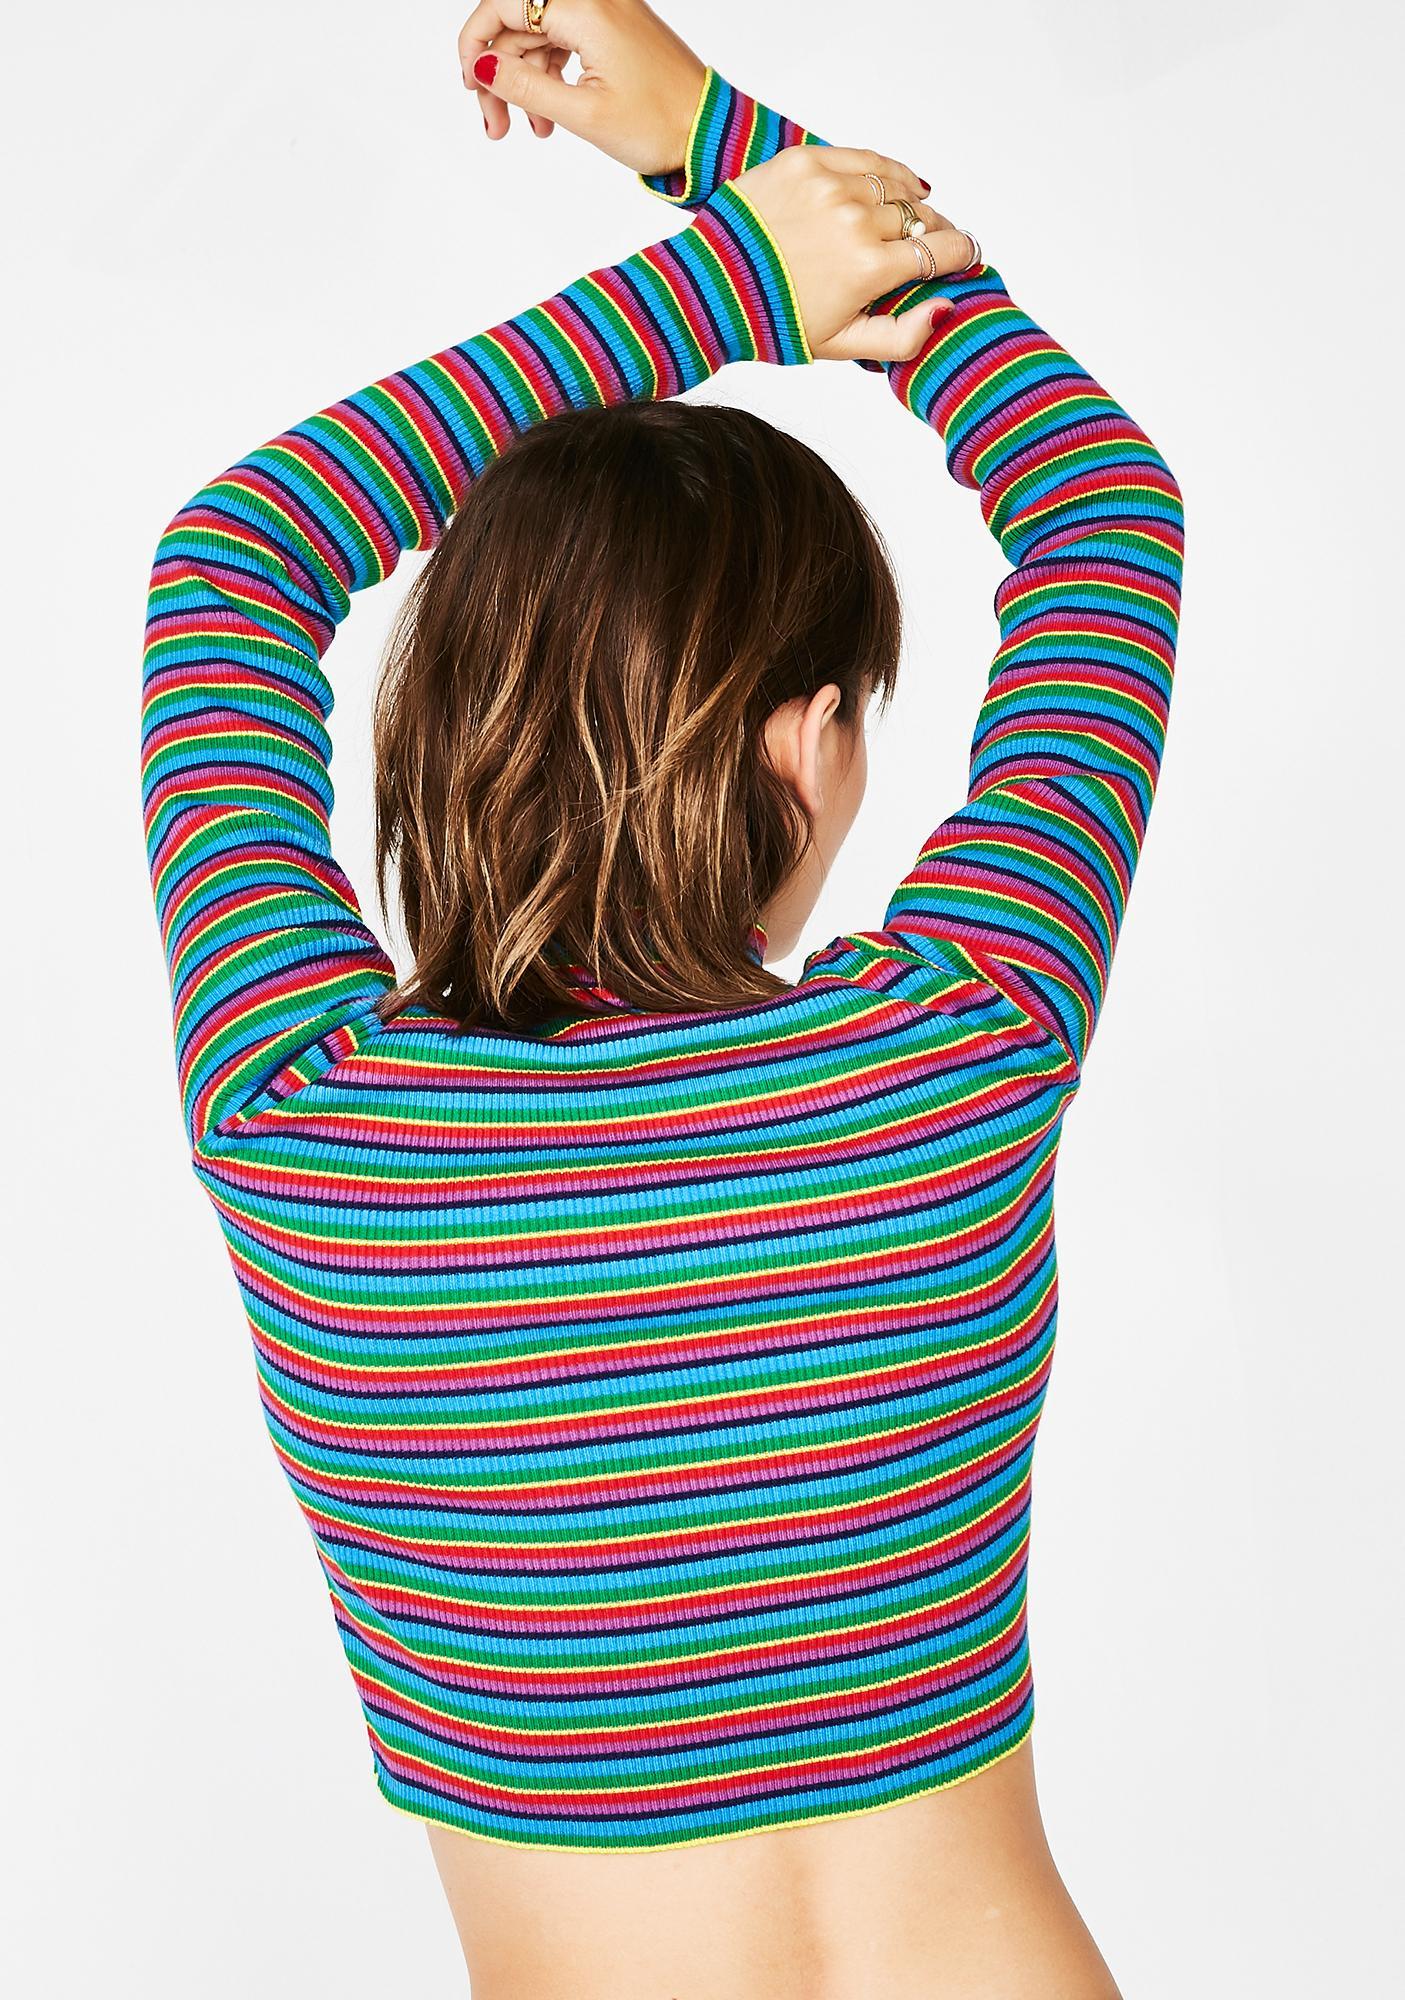 Minga Striped Ribbed O-Ring Zip Top